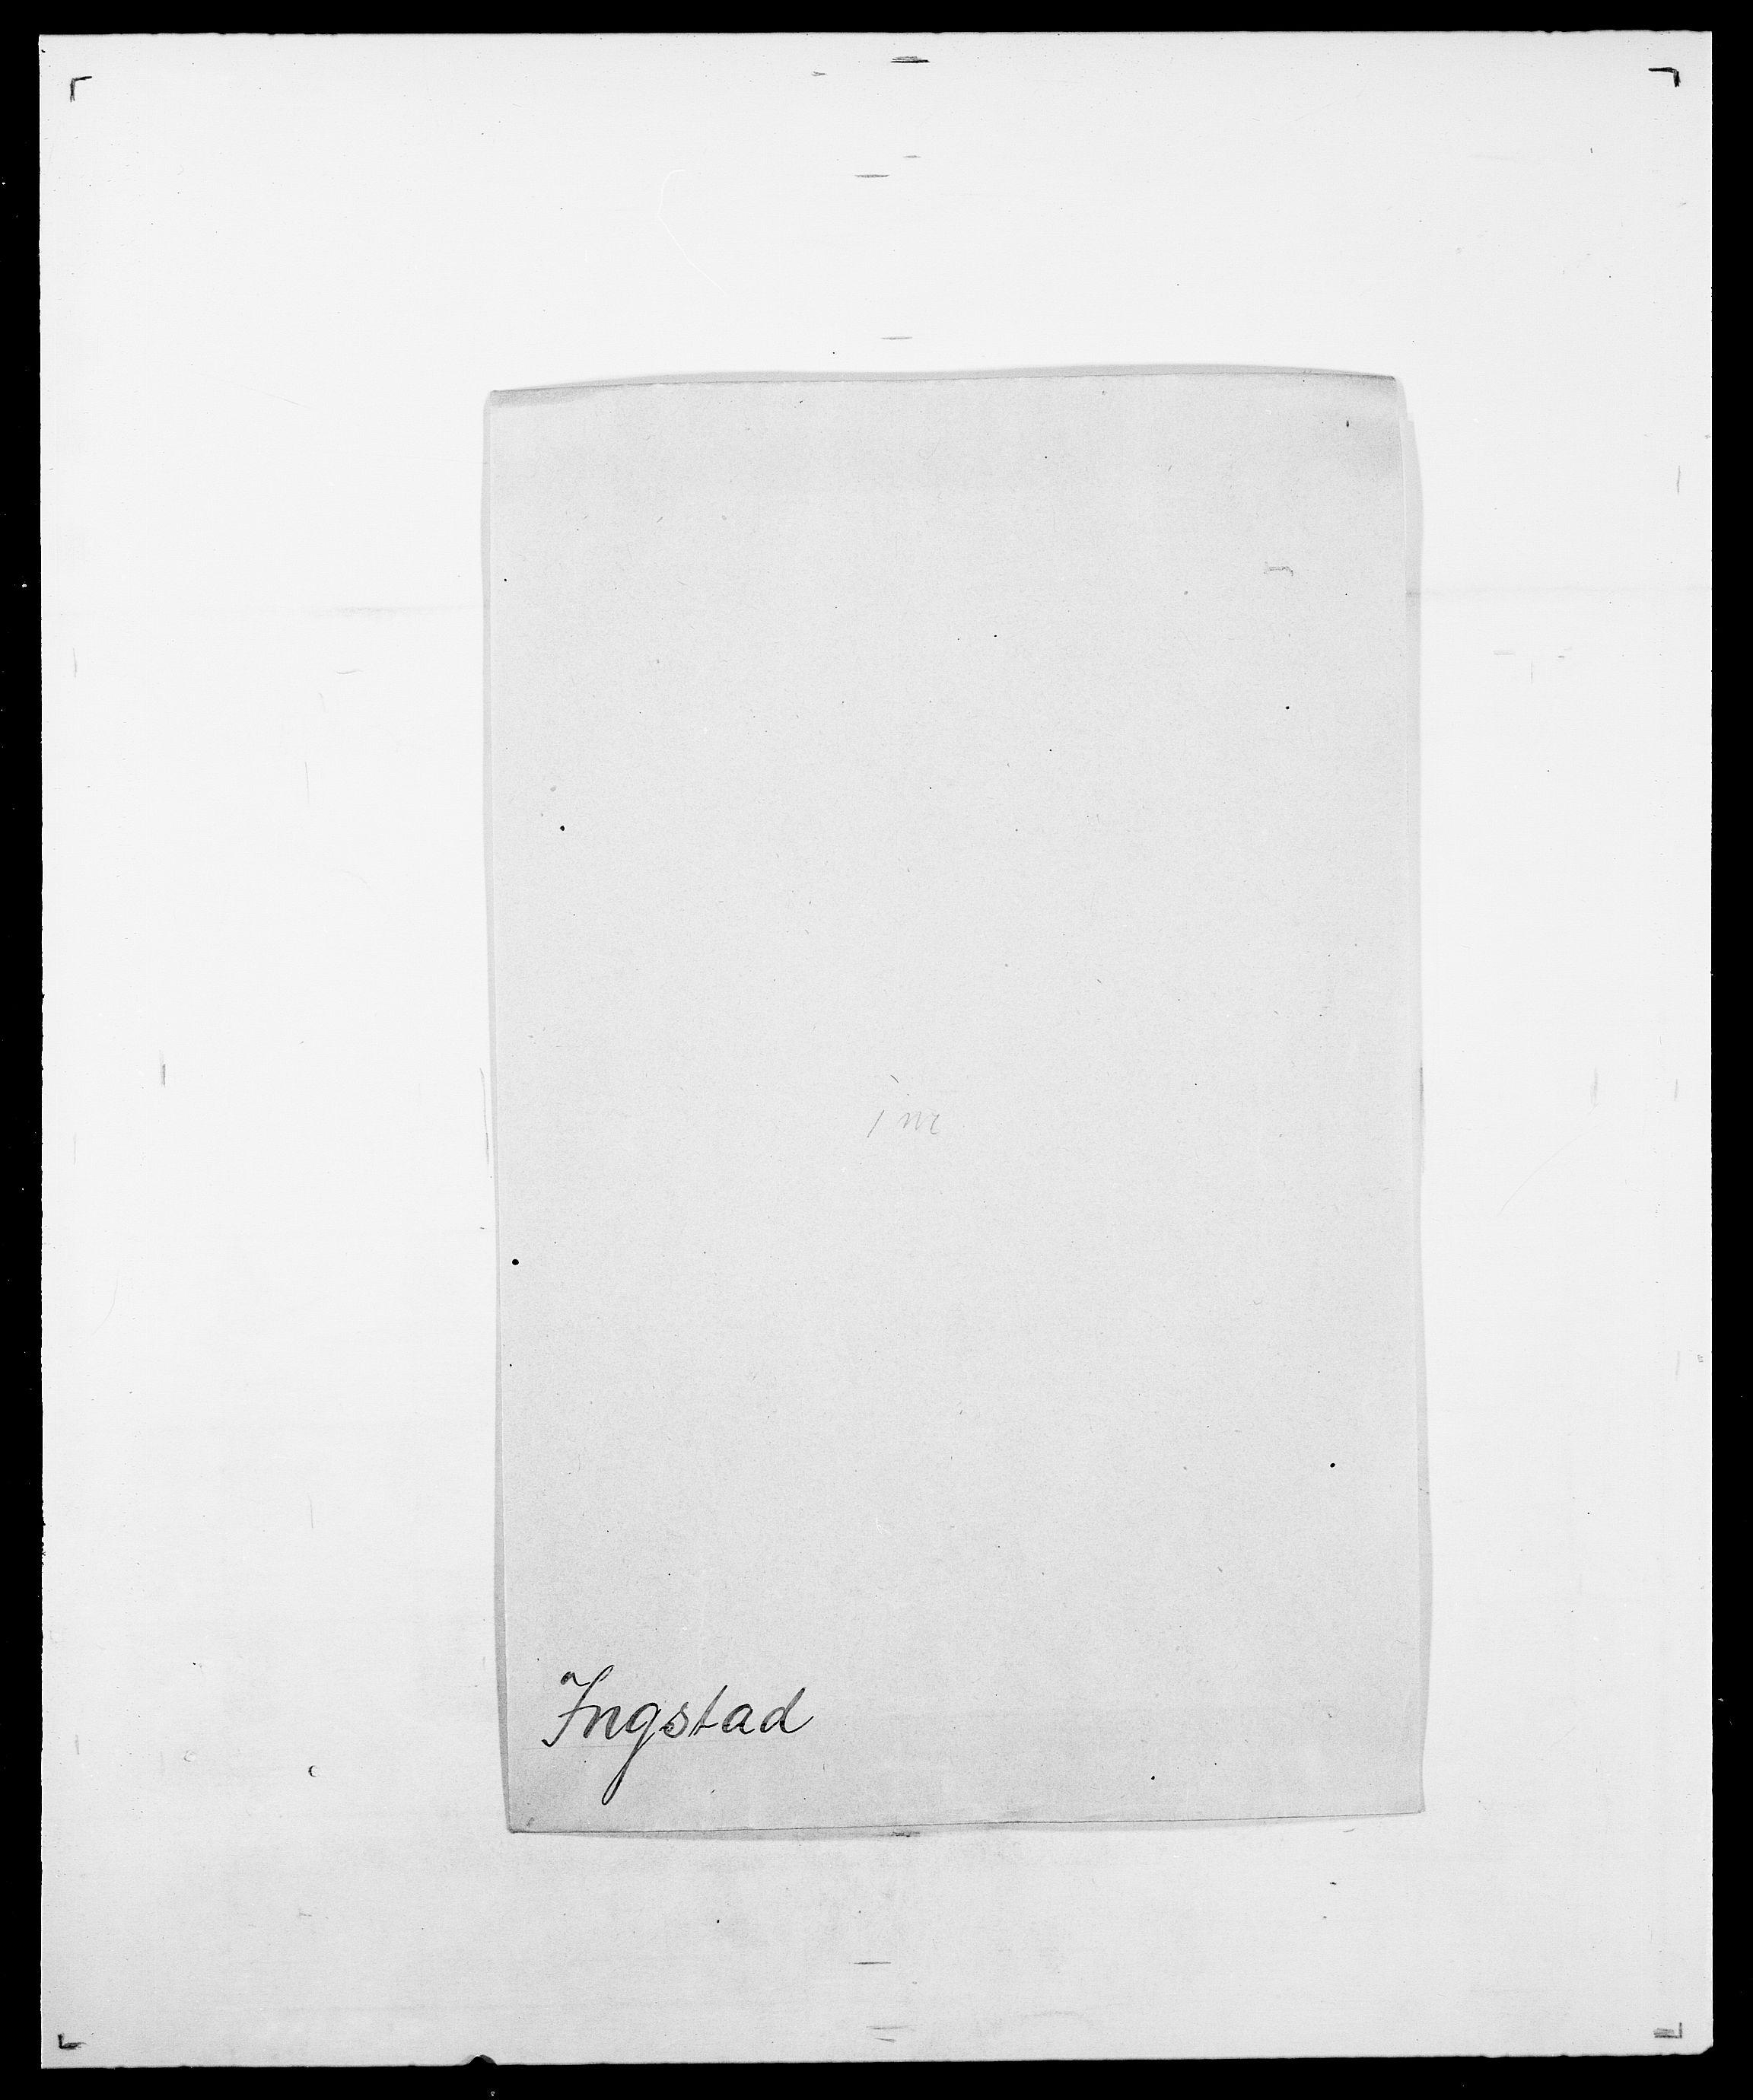 SAO, Delgobe, Charles Antoine - samling, D/Da/L0019: van der Hude - Joys, s. 796